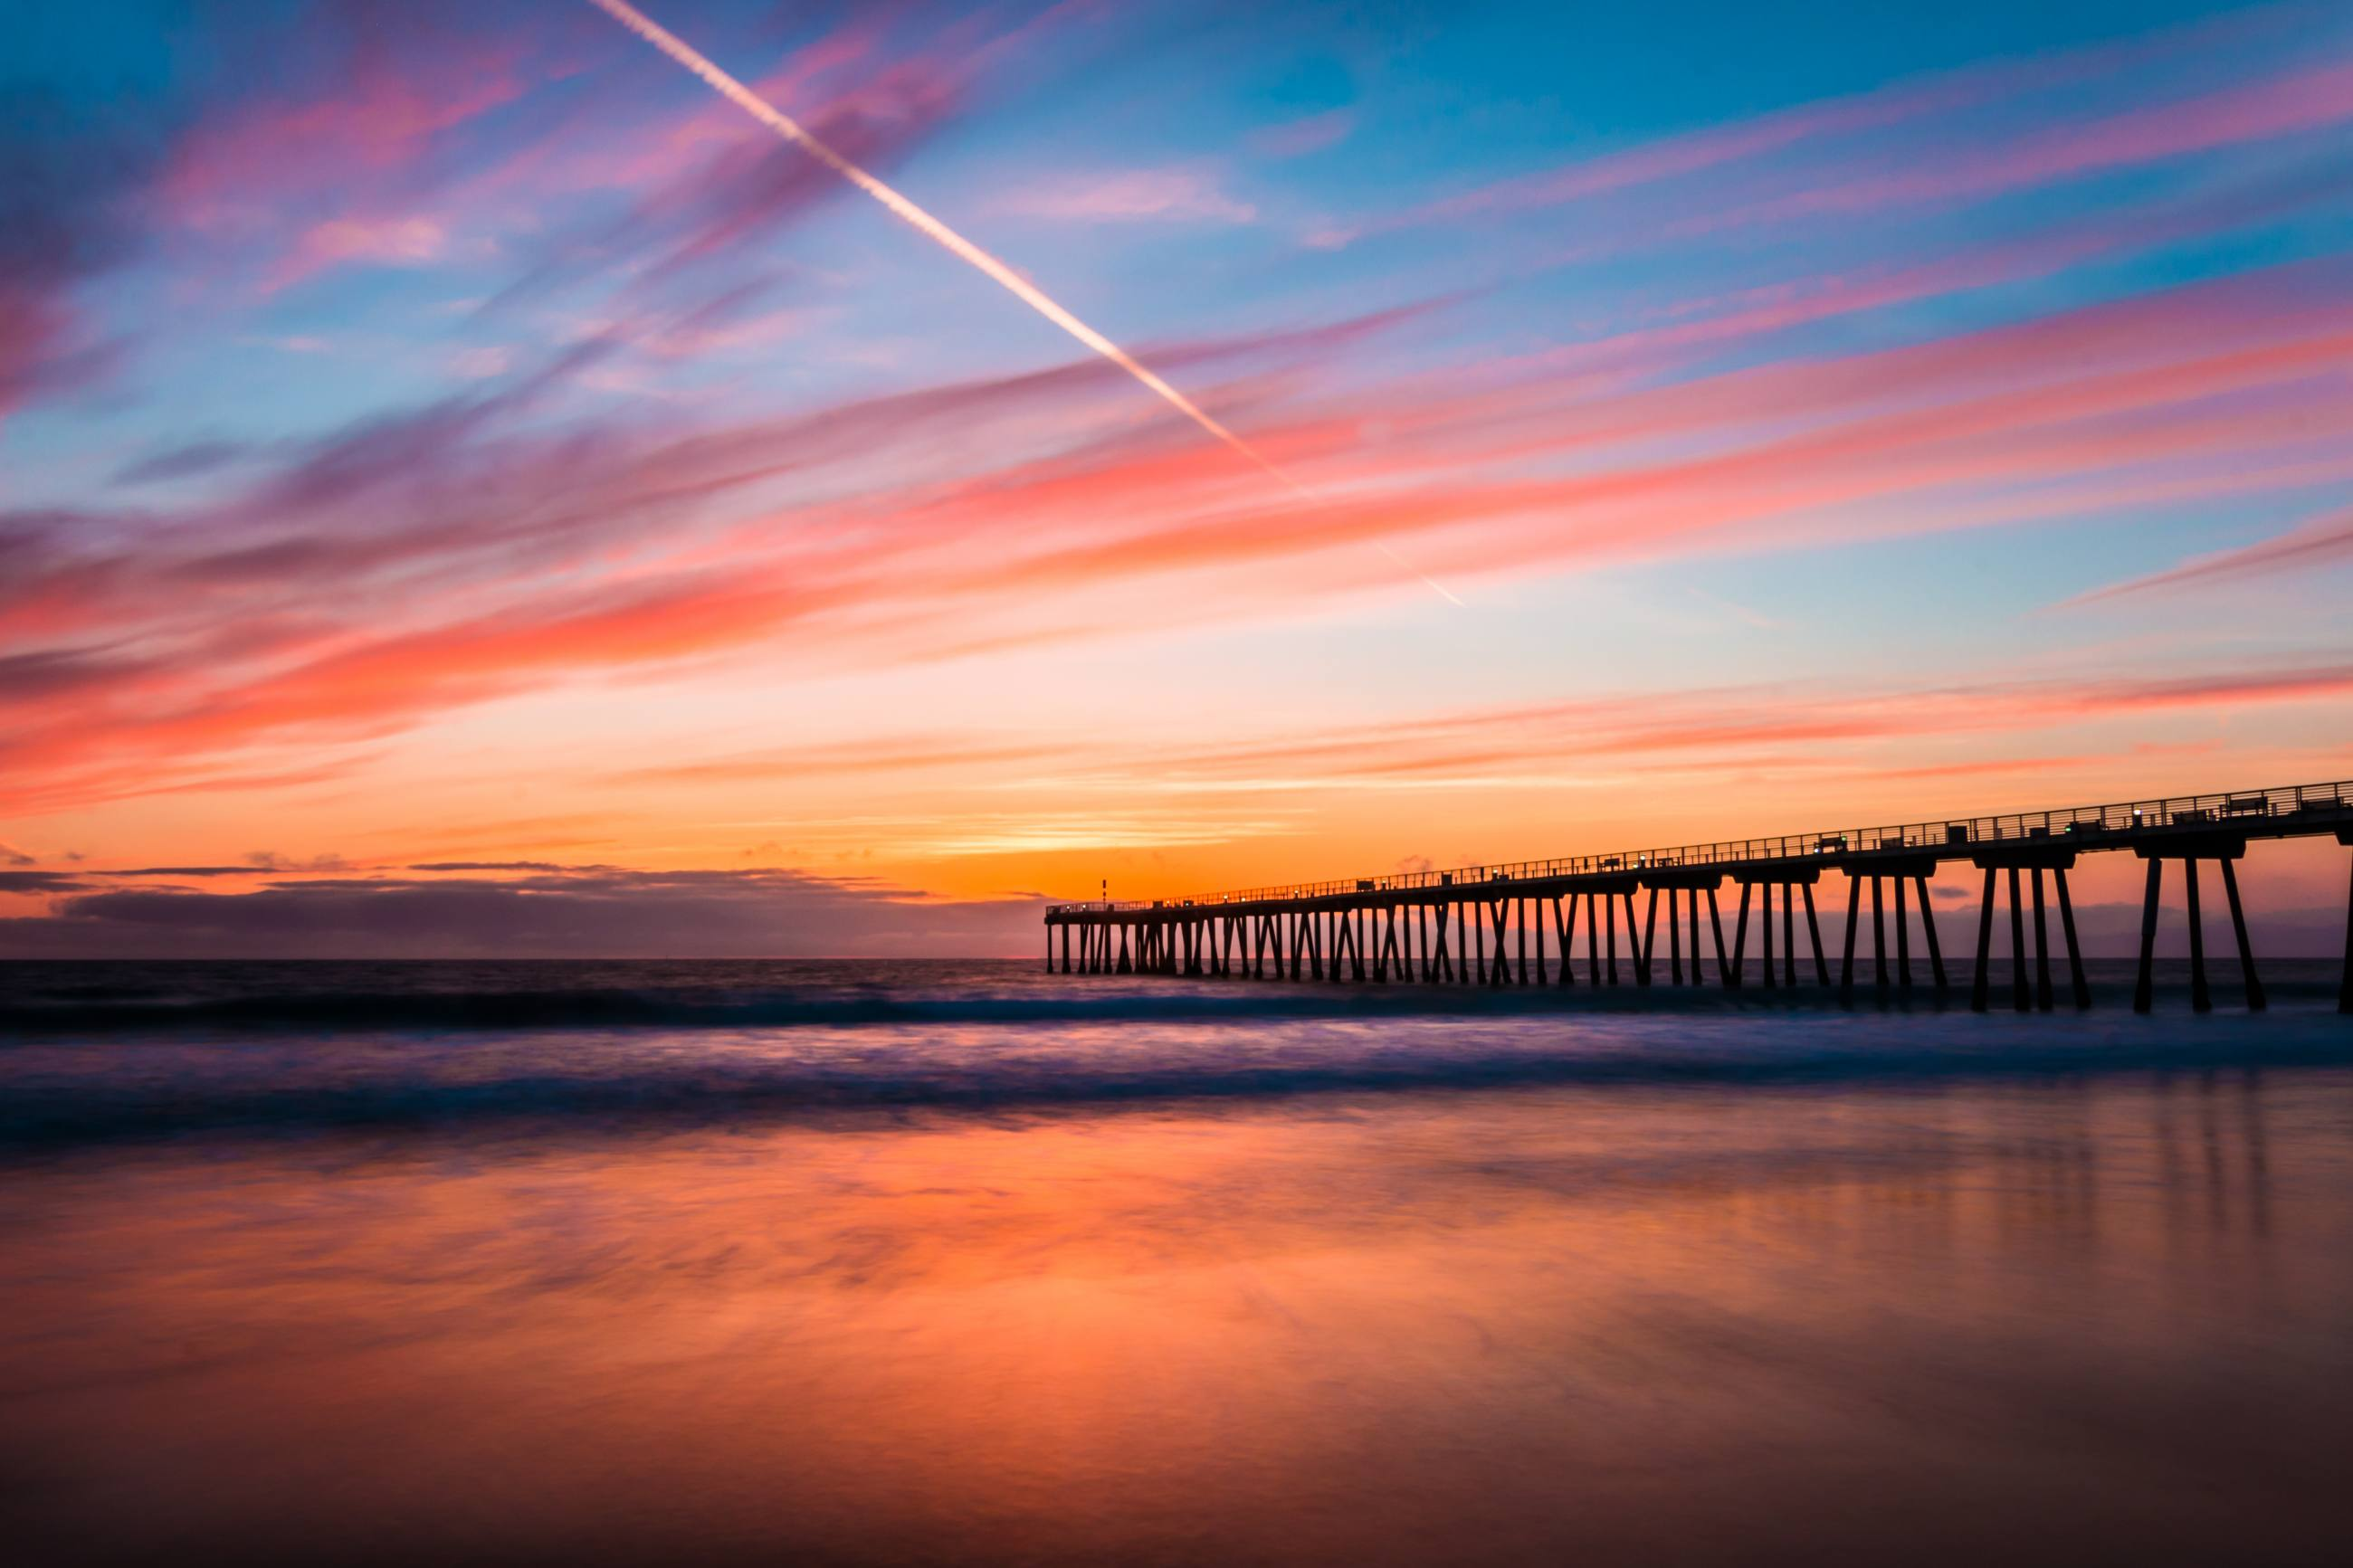 Hermosa Beach Pier at sunset